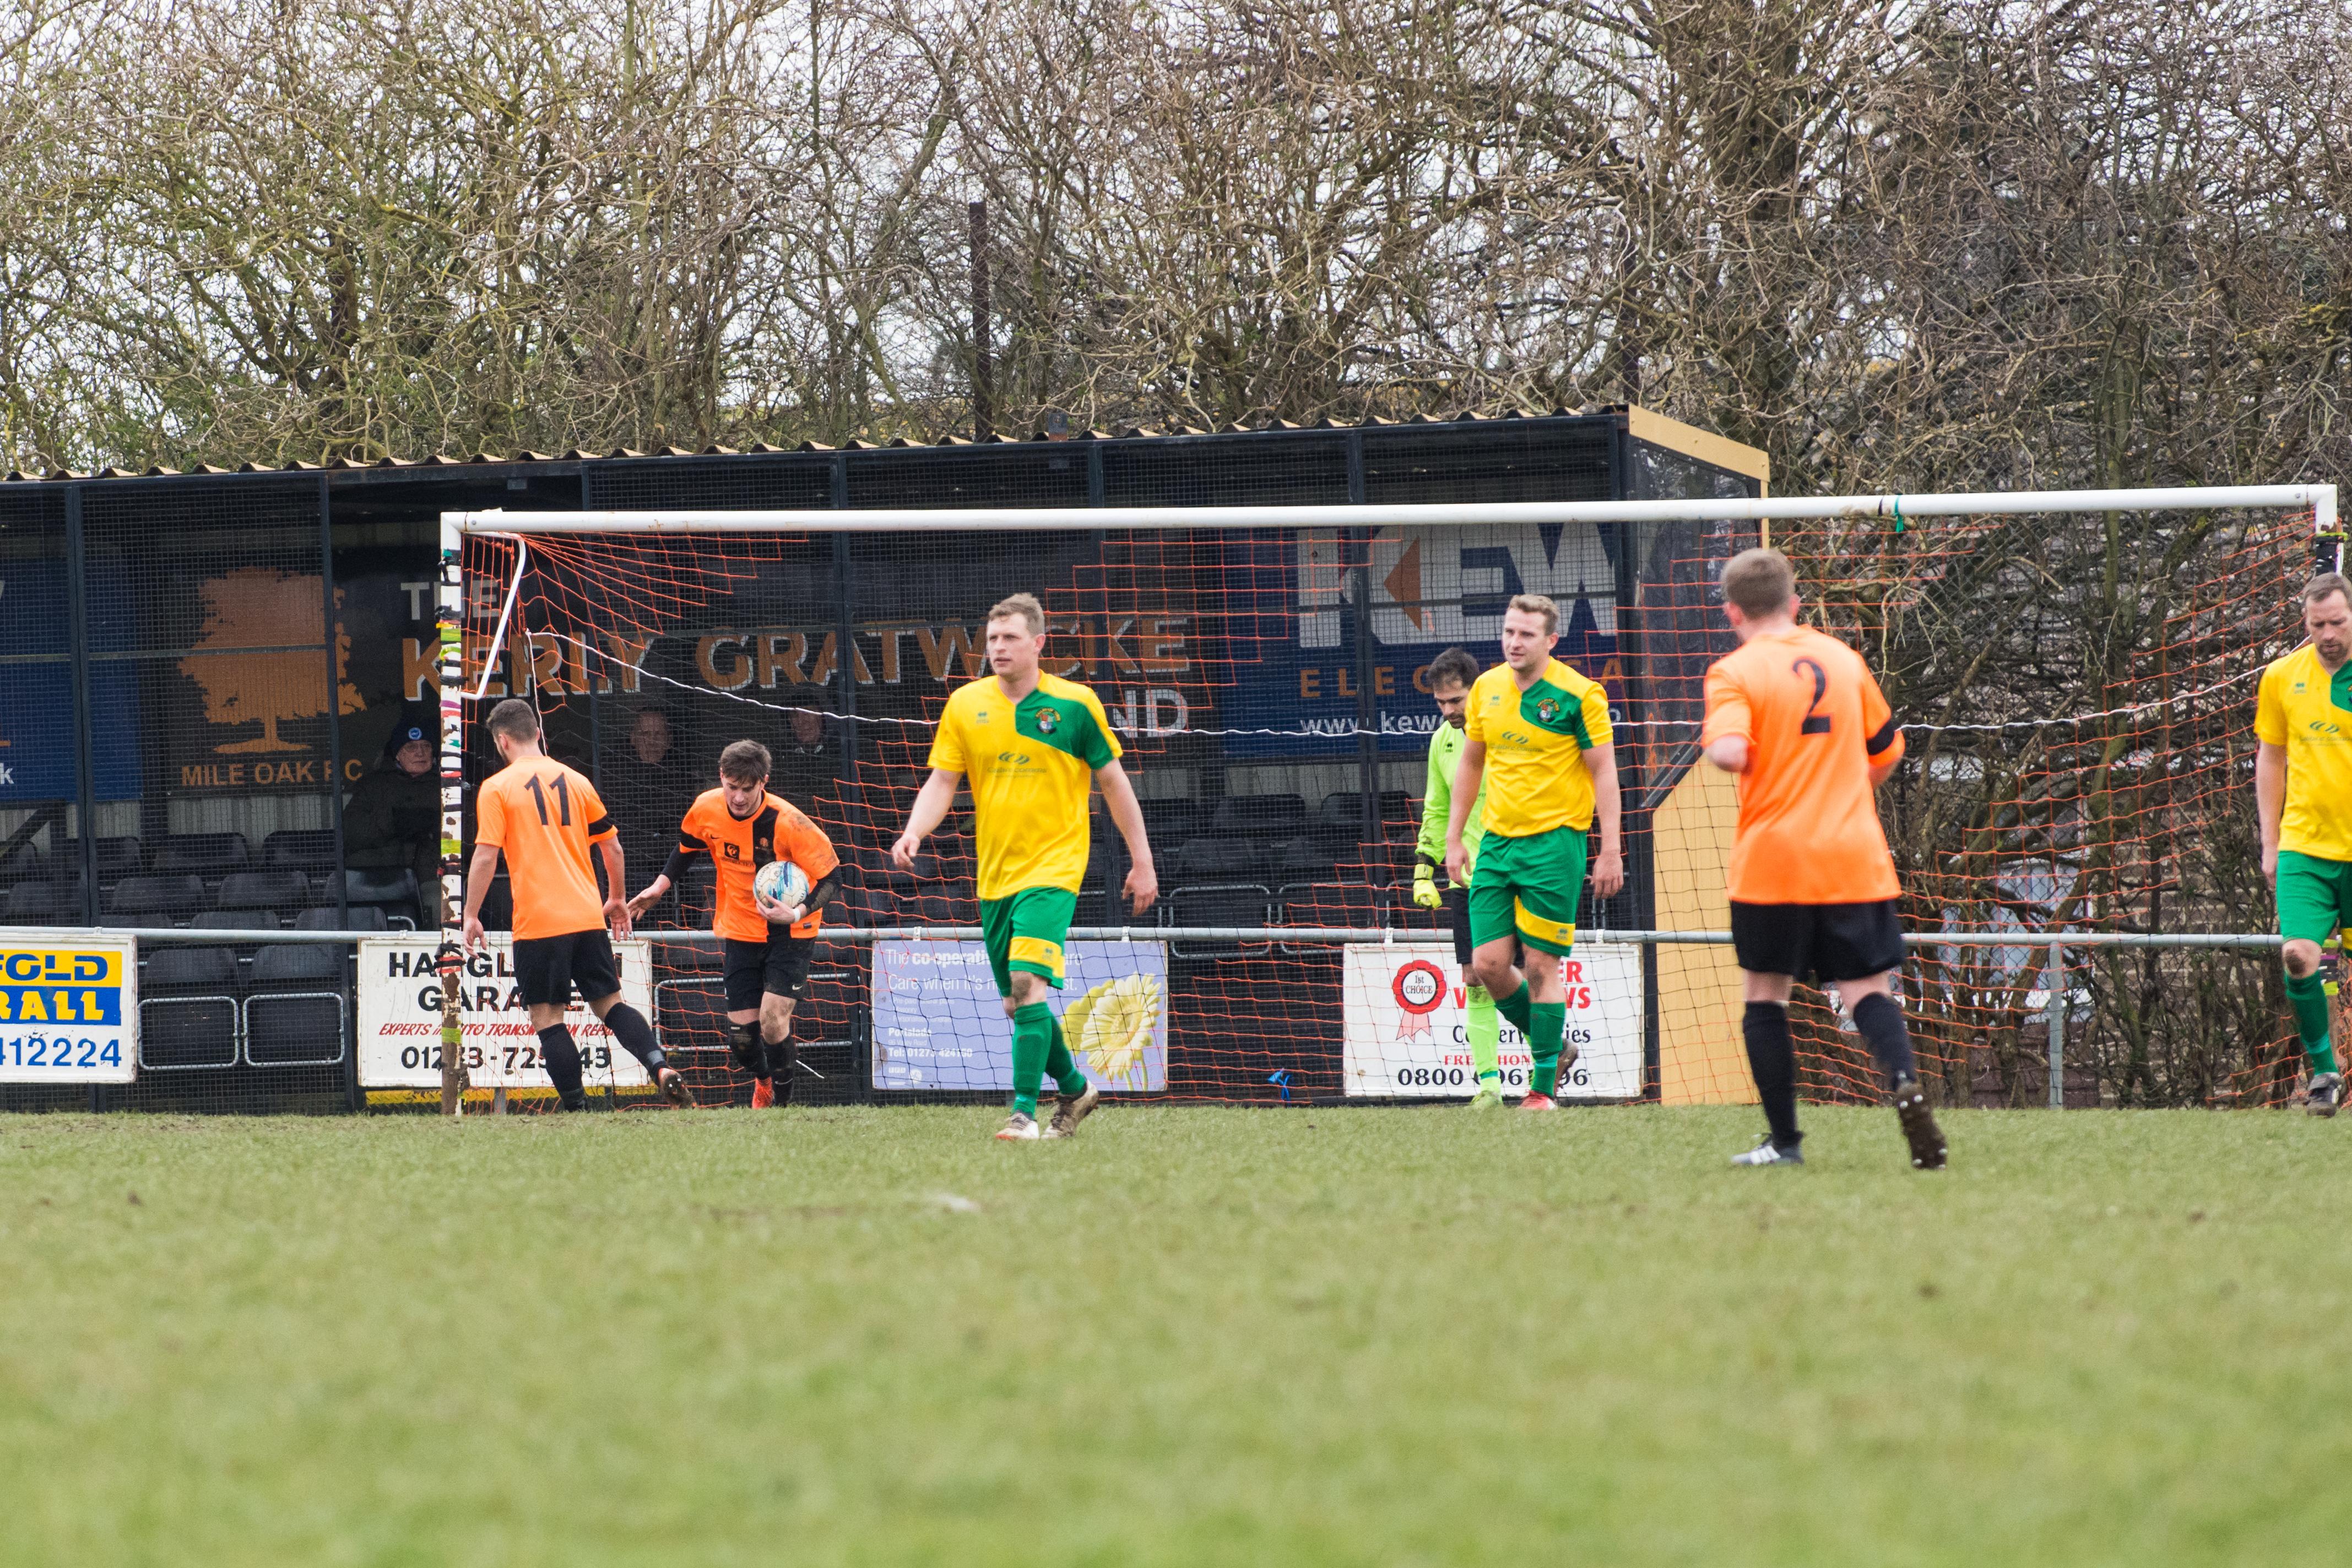 DAVID_JEFFERY Mile Oak FC vs Hailsham Town FC 24.03.18 77